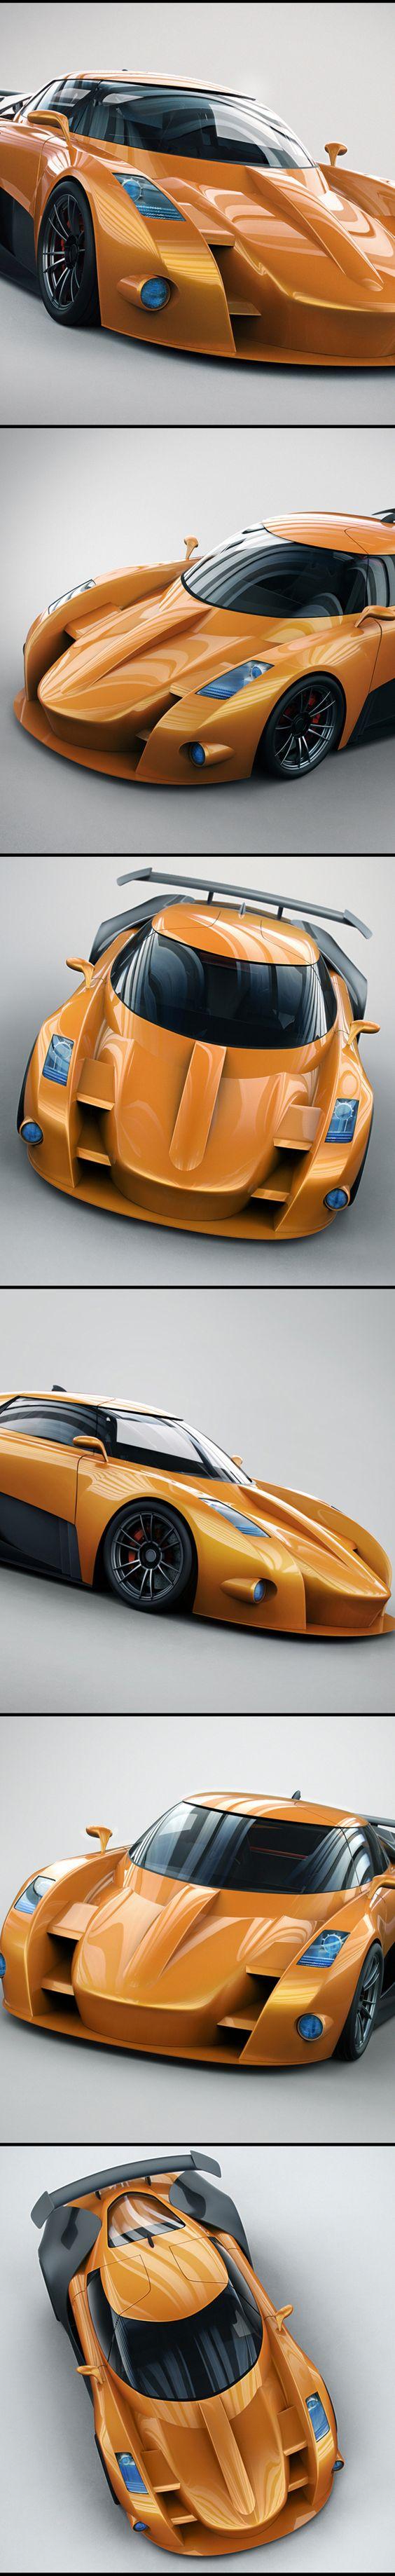 30711c5603a6543ff4368b4fec11c059--behance-net-retro-cars Fabulous Ferrari Mondial T In Vendita Cars Trend